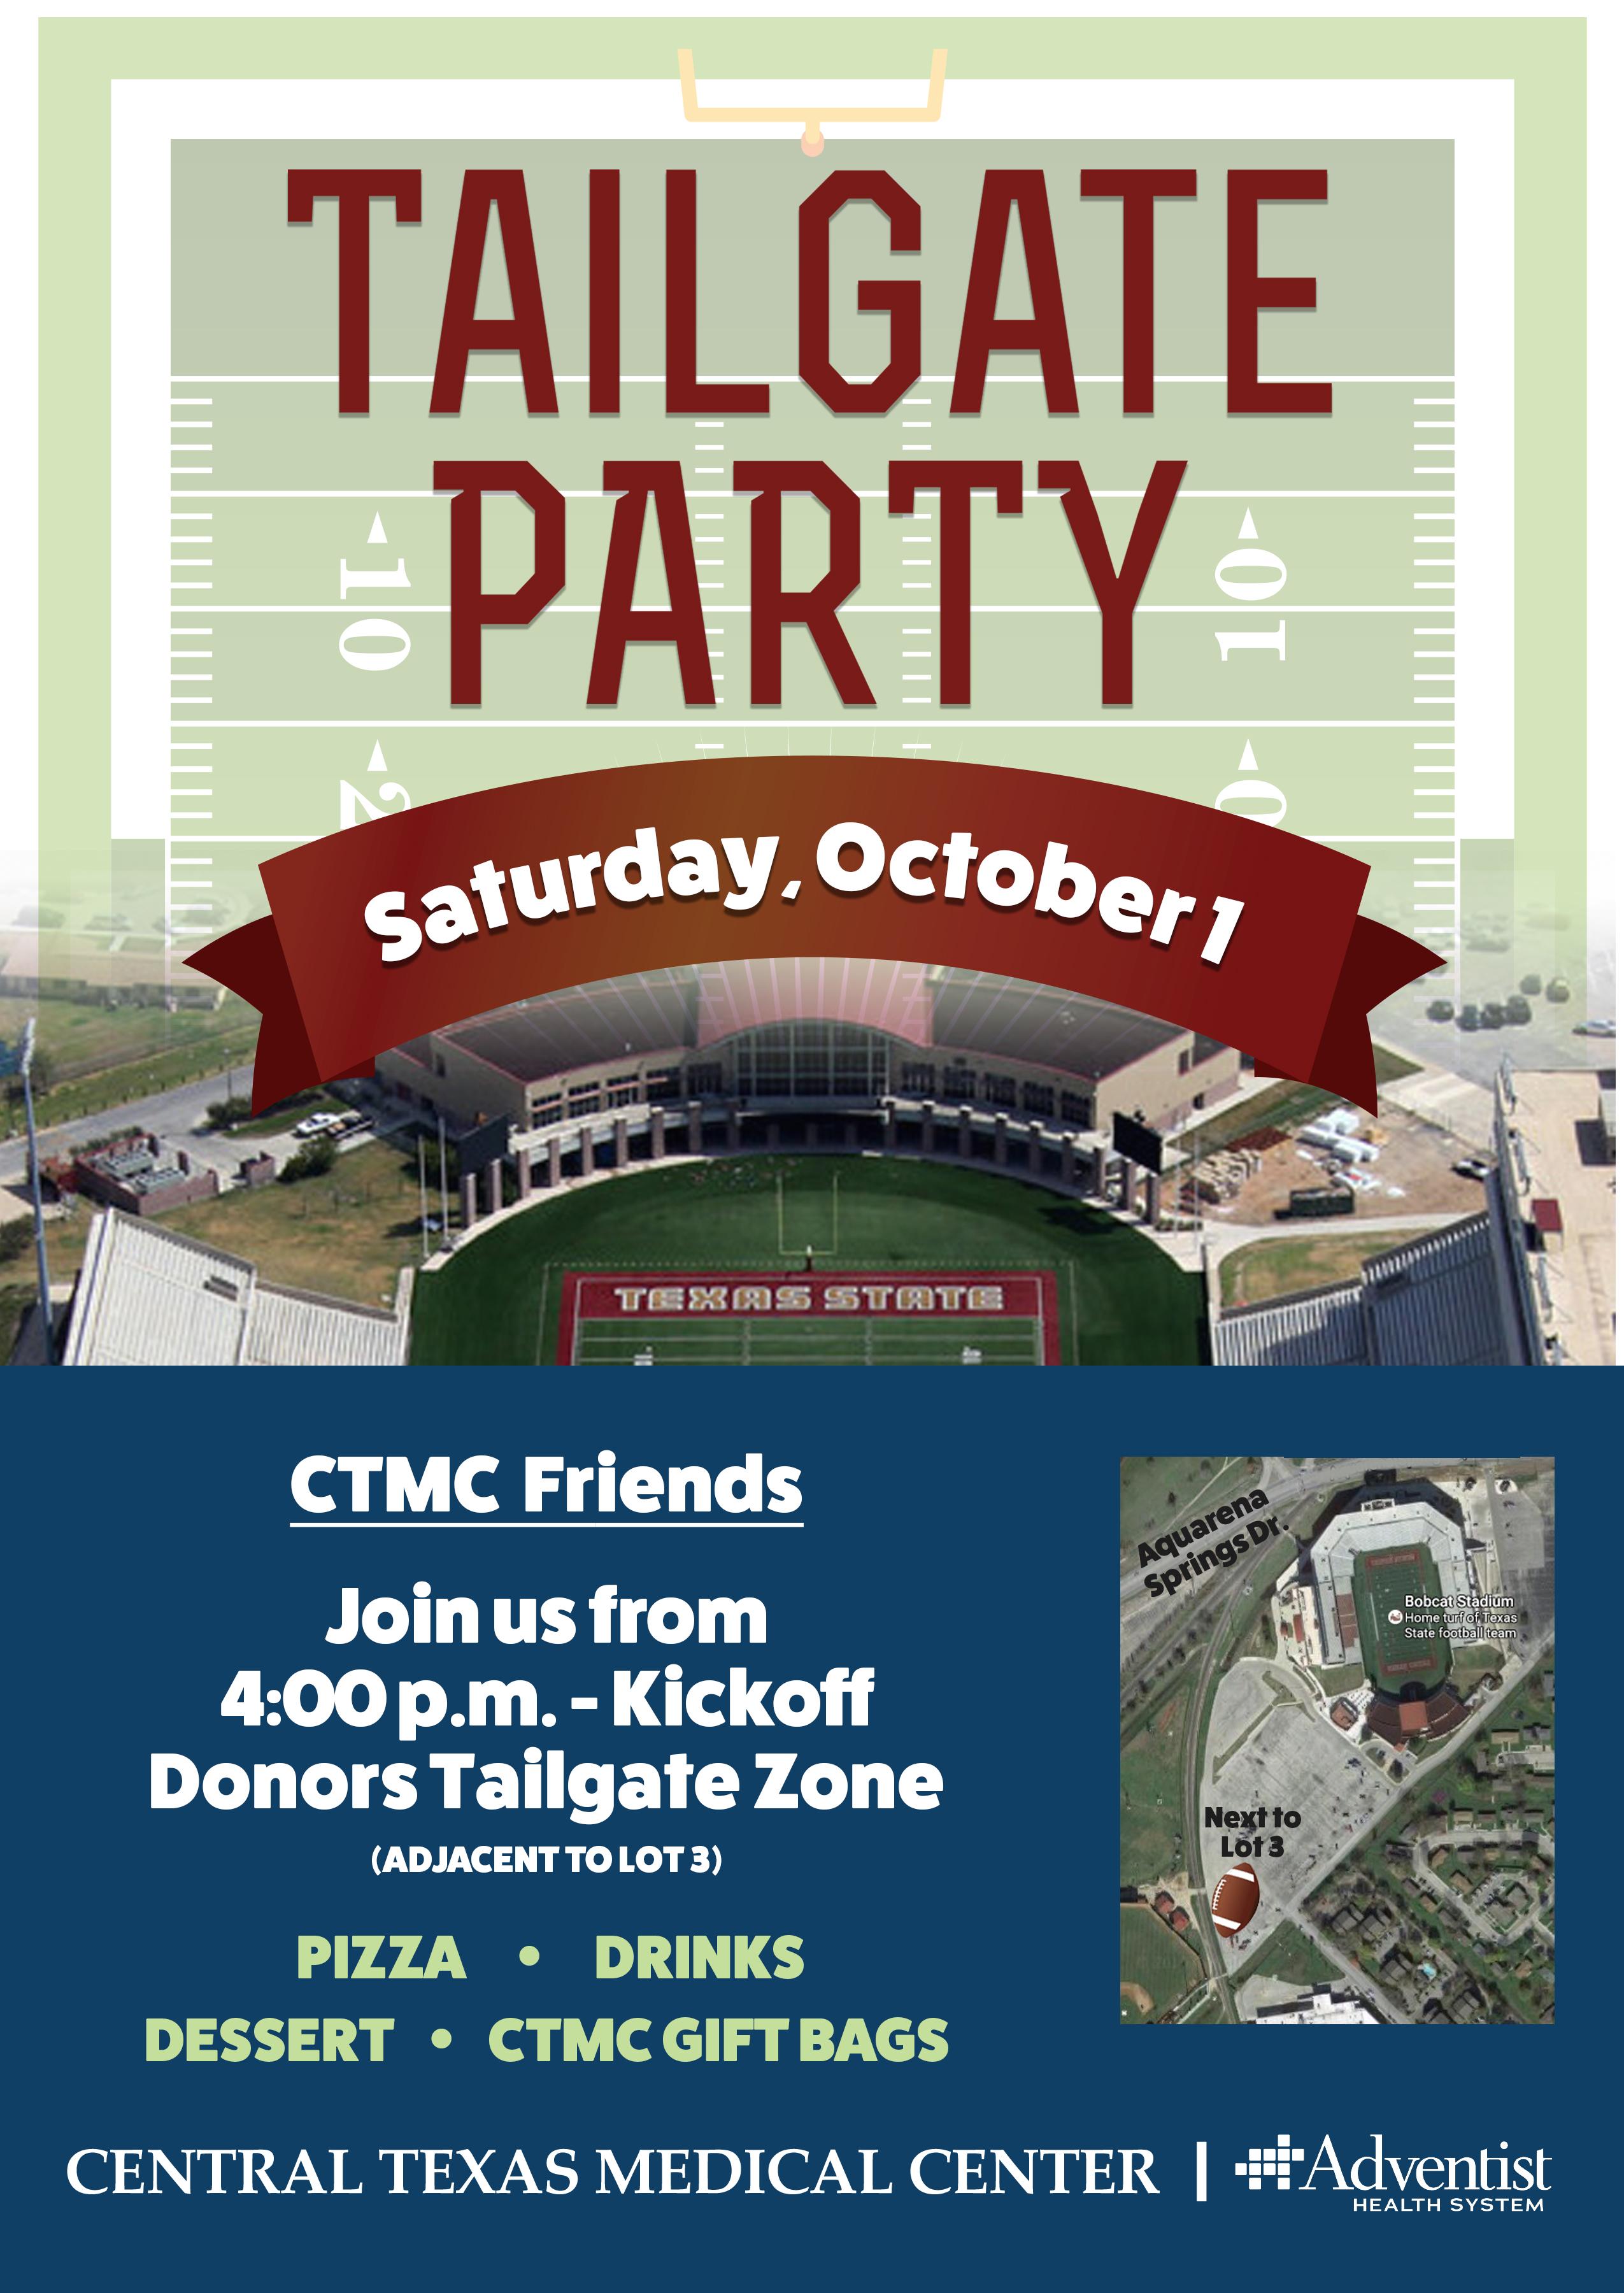 CTMC Tailgate Party Invitation